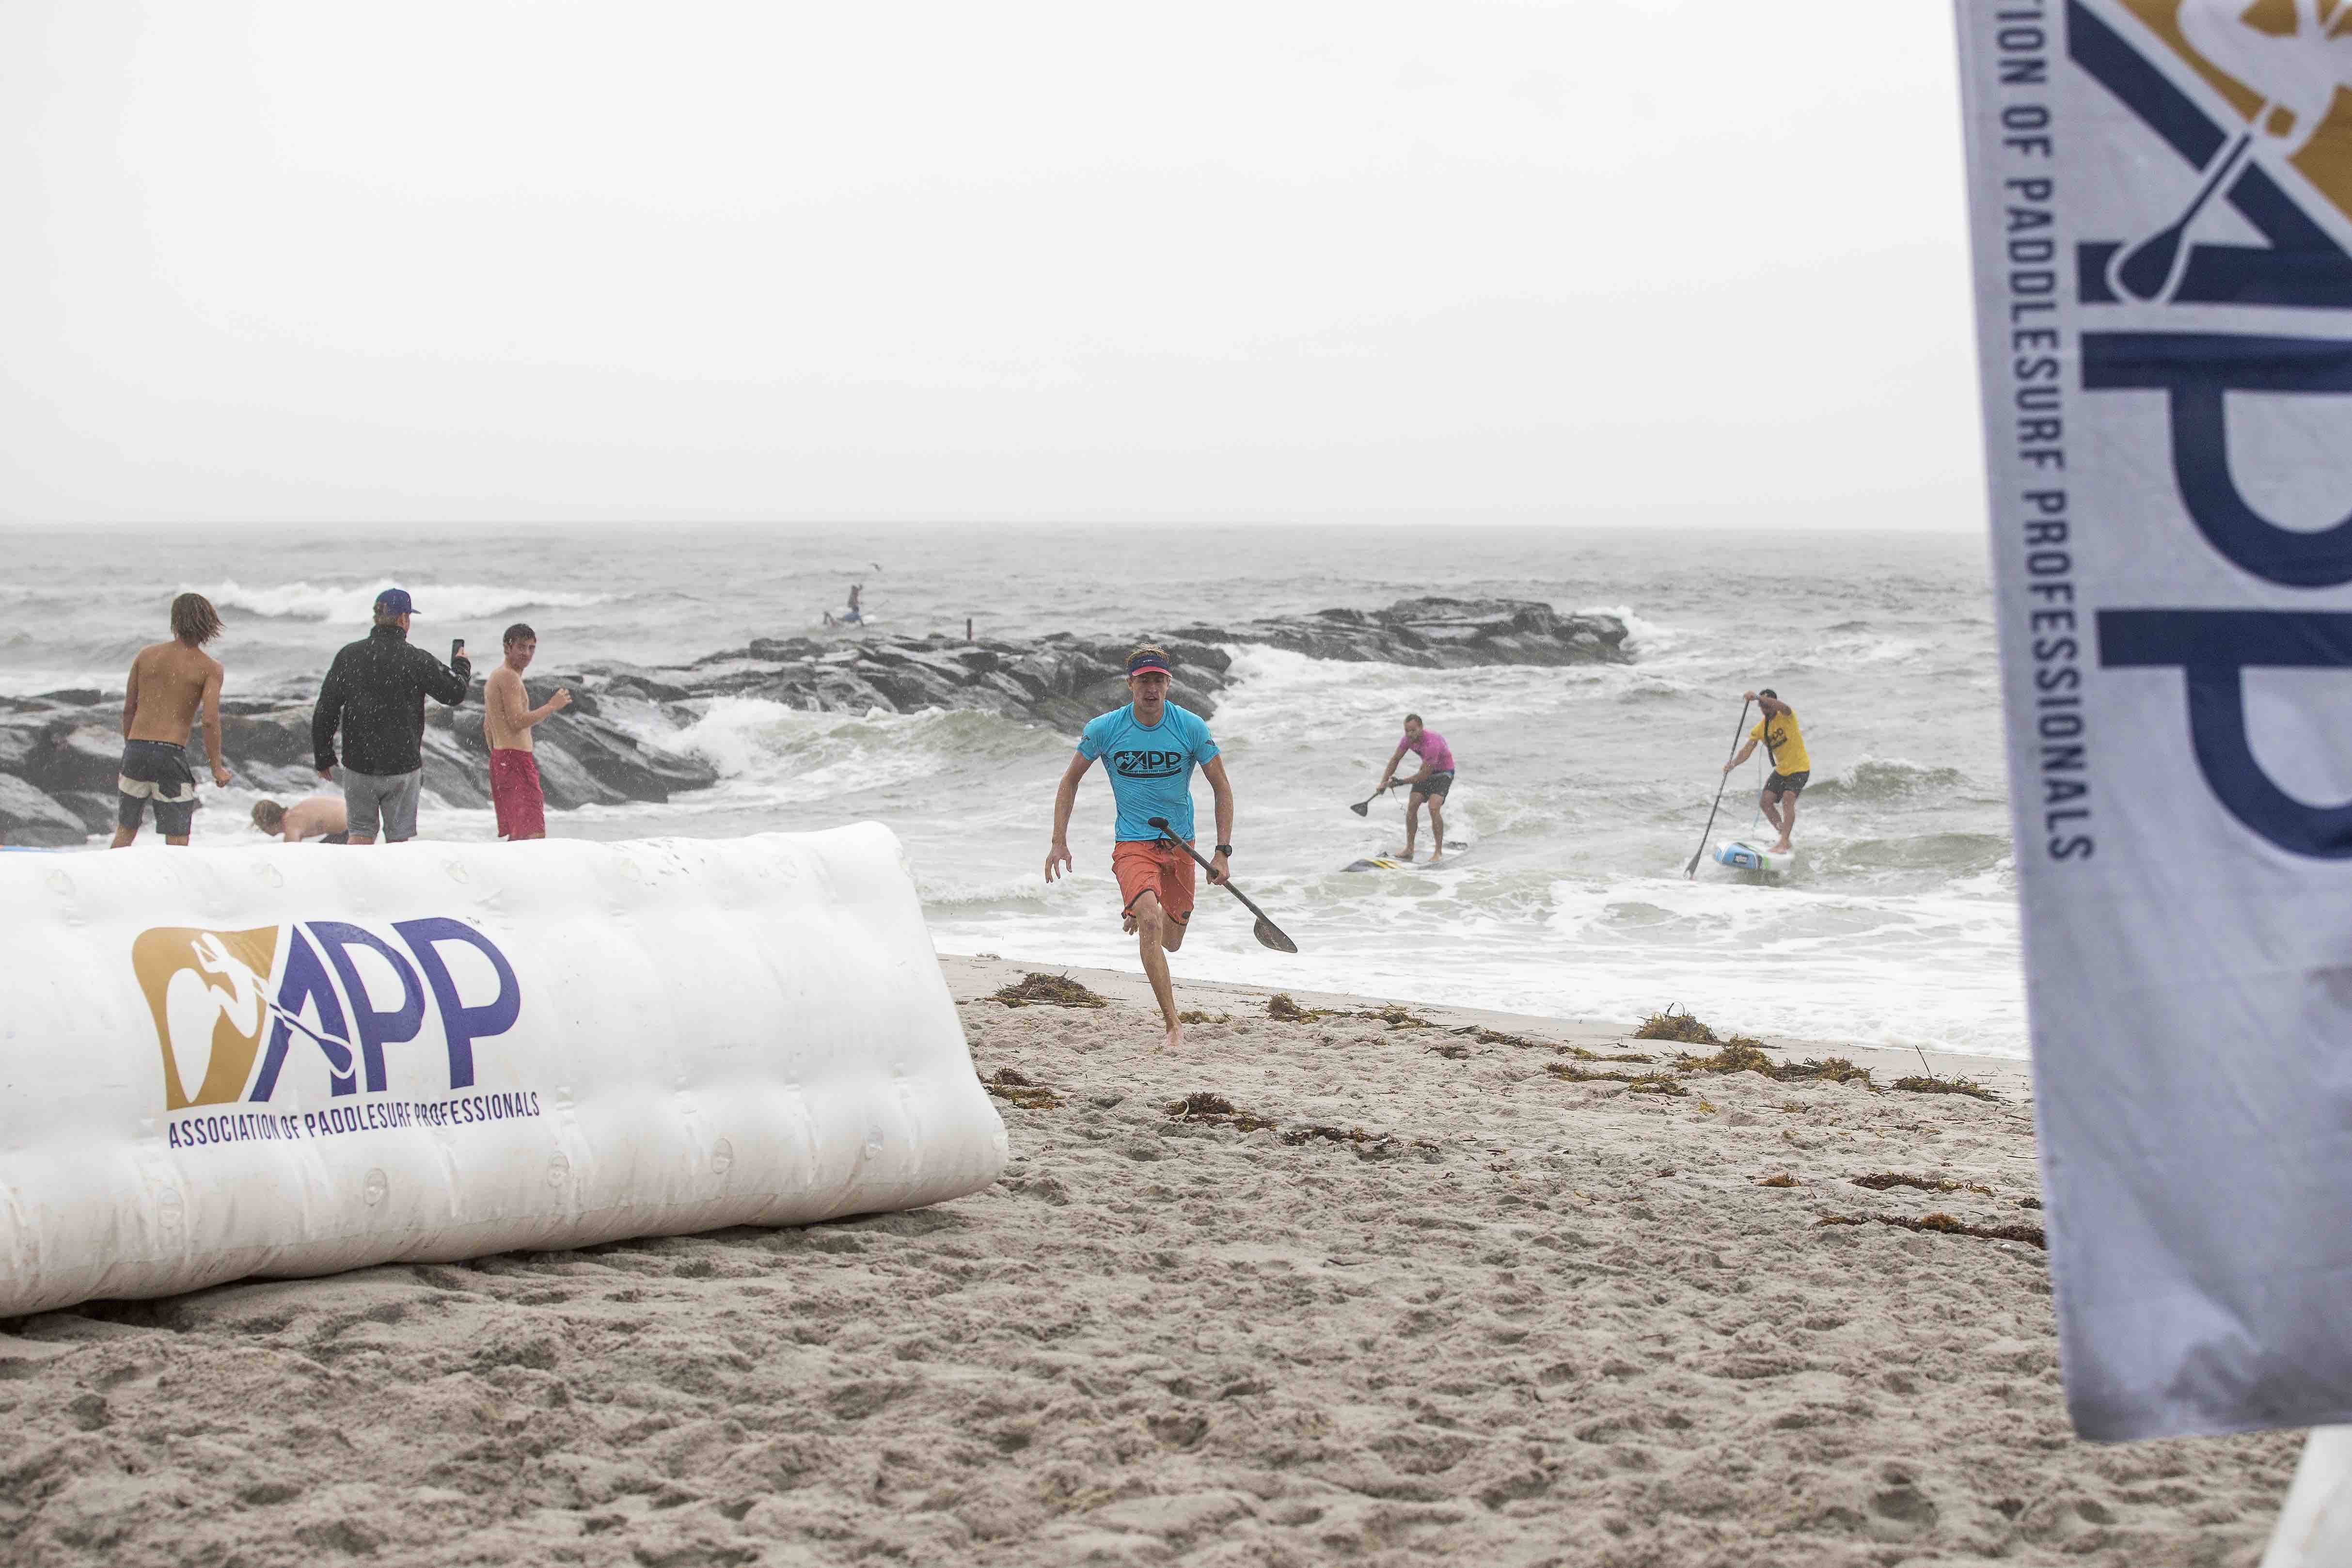 connor-baxter-back-app-2018-ny-sup-open-sprint-beach-race-finish-line